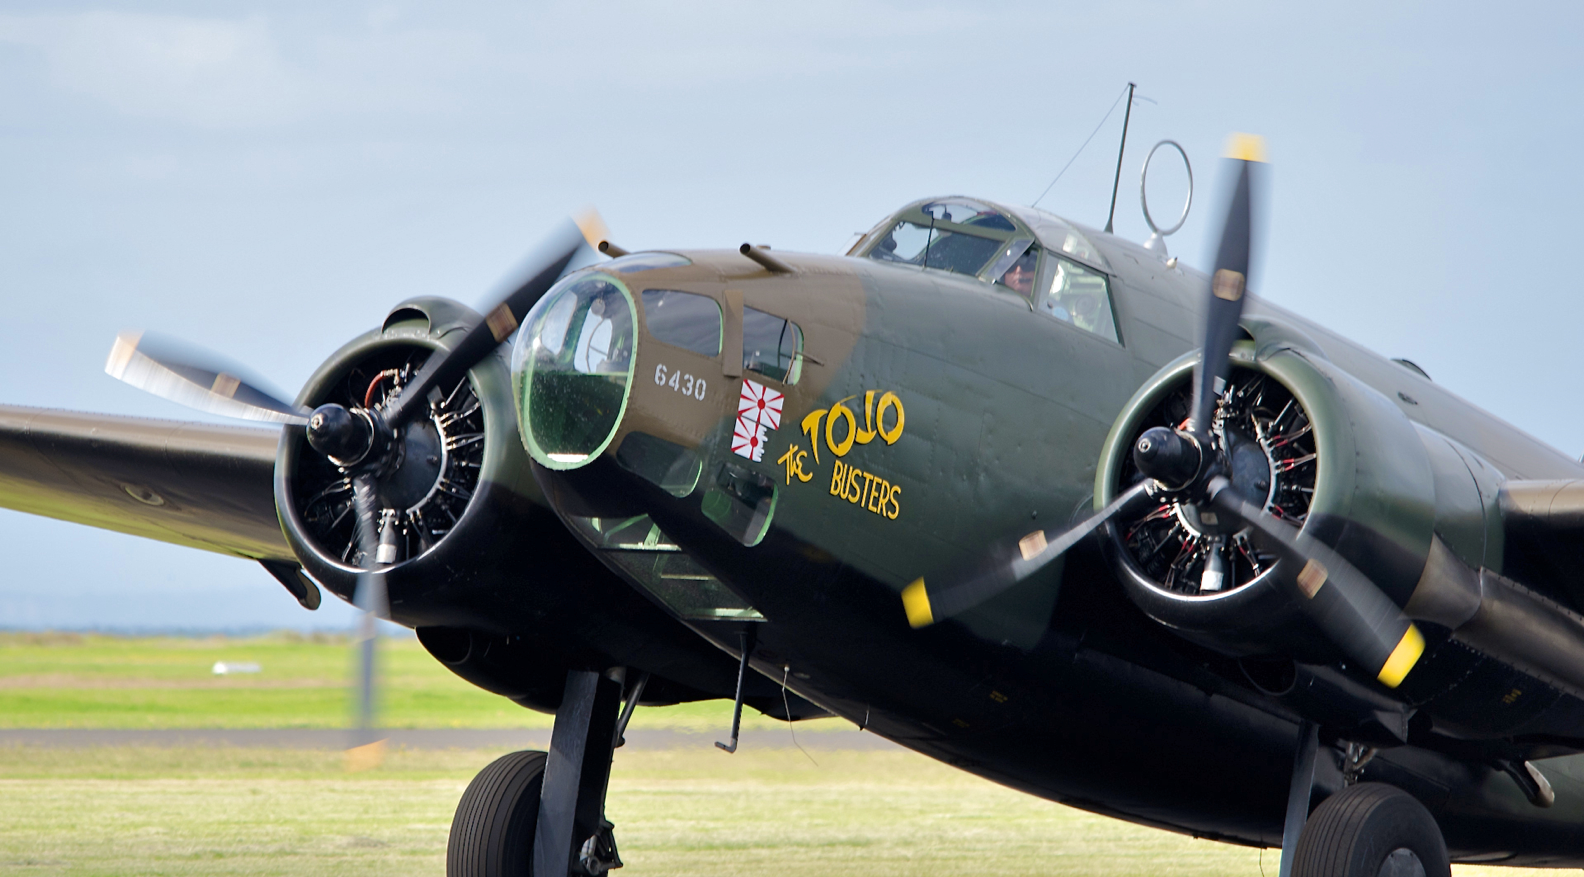 Бомбардировщик Lockheed Hudson Mk IIIA